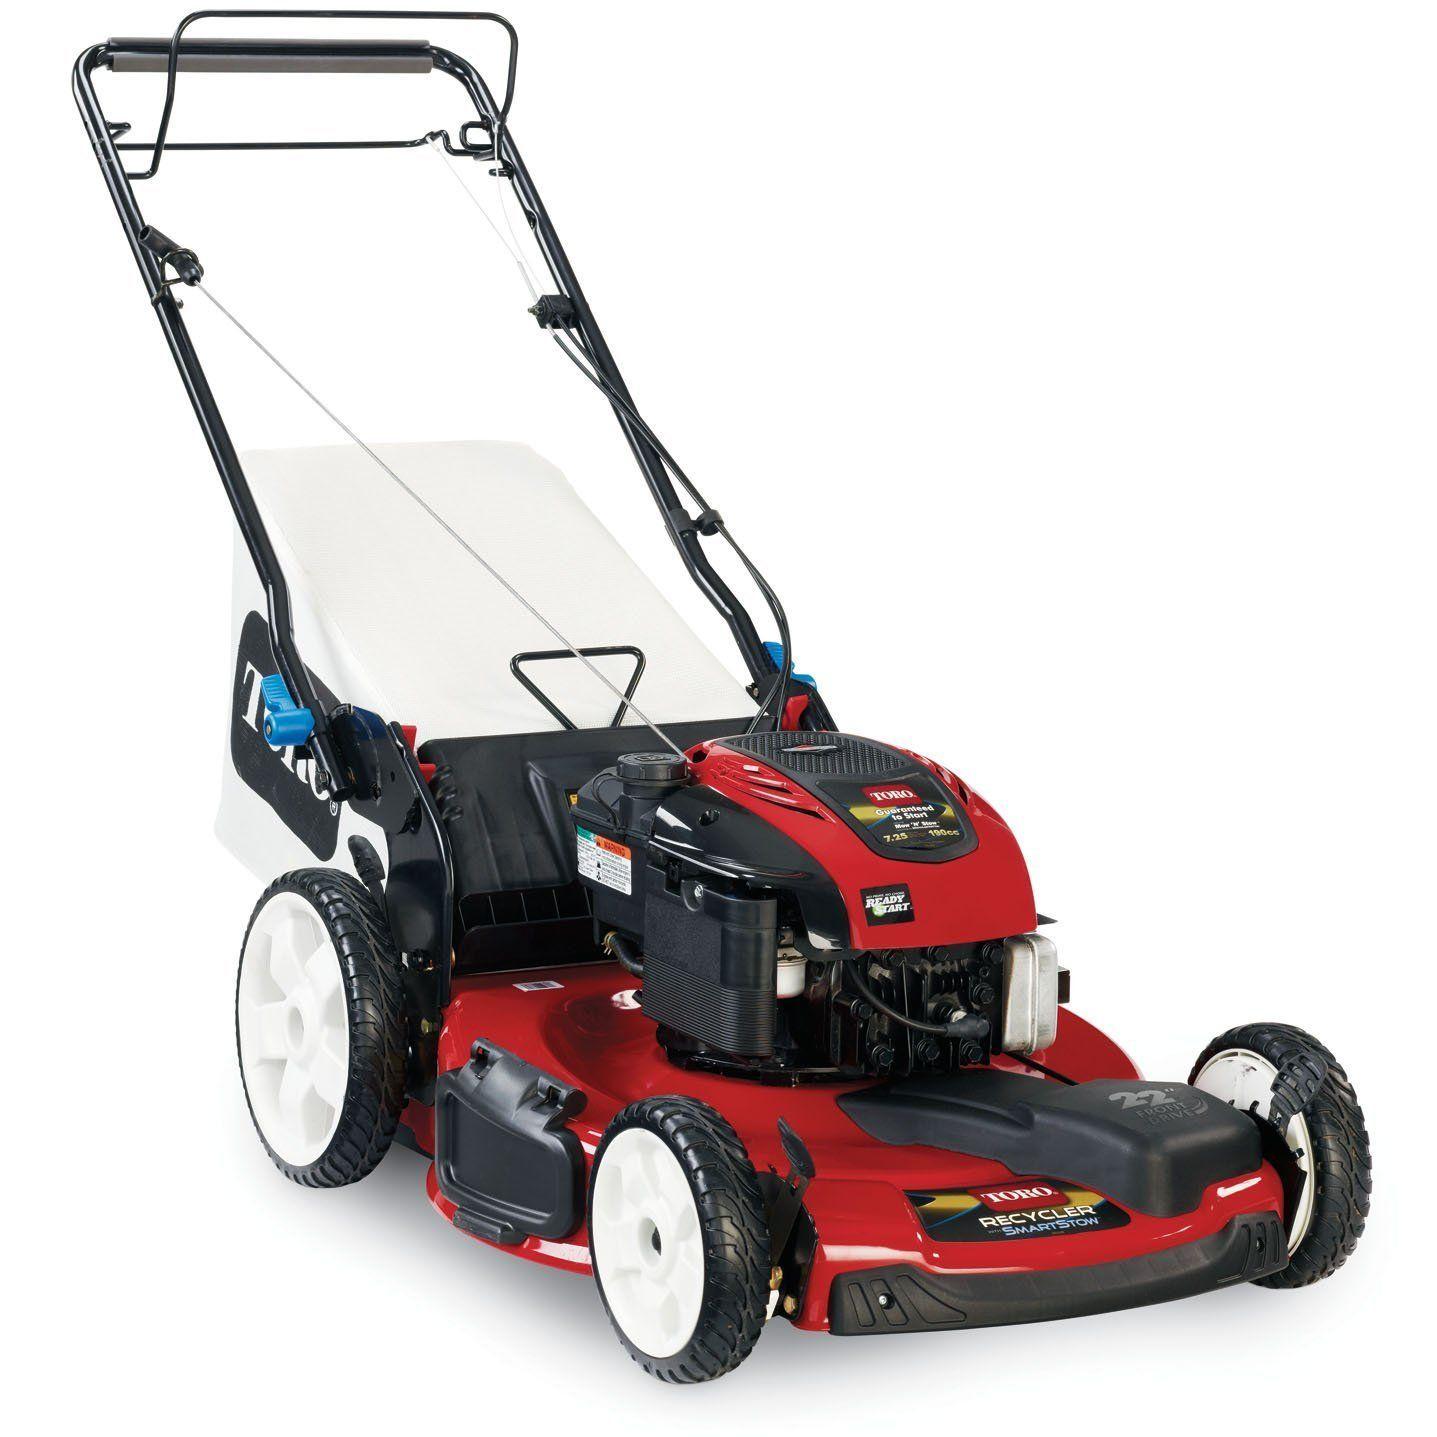 Toro Smrt Stow Sp Mwr22 Best Push Lawn Mower 2019 Best Push Lawn Mower 2019 In 2020 Lawn Mower Push Lawn Mower Gas Lawn Mower